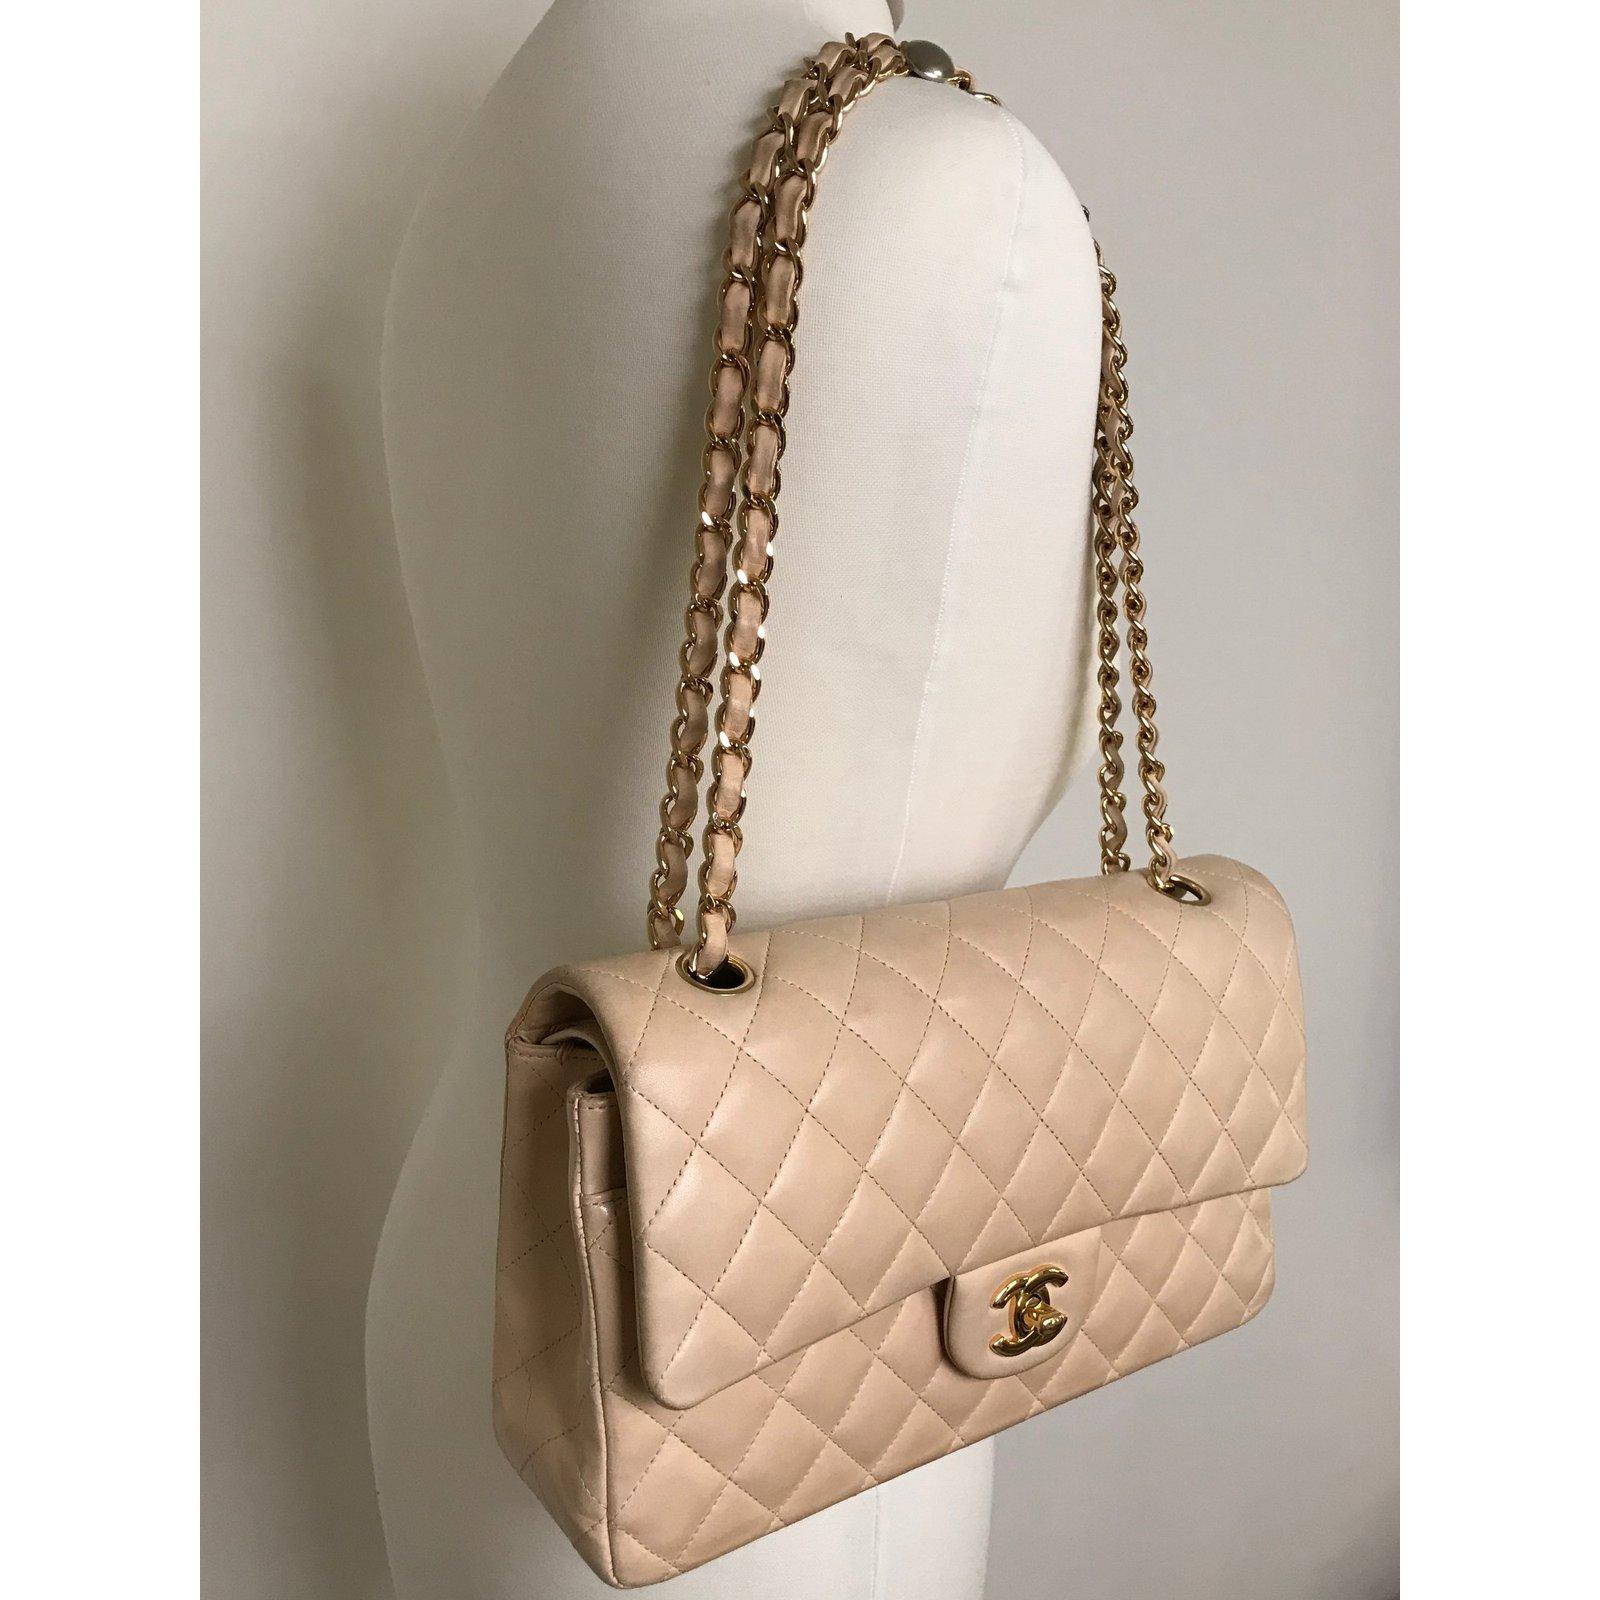 2f66d5a5c0d9 Chanel Chanel Timeless Medium Double Flap Bag Handbags Lambskin Beige  ref.63544 - Joli Closet